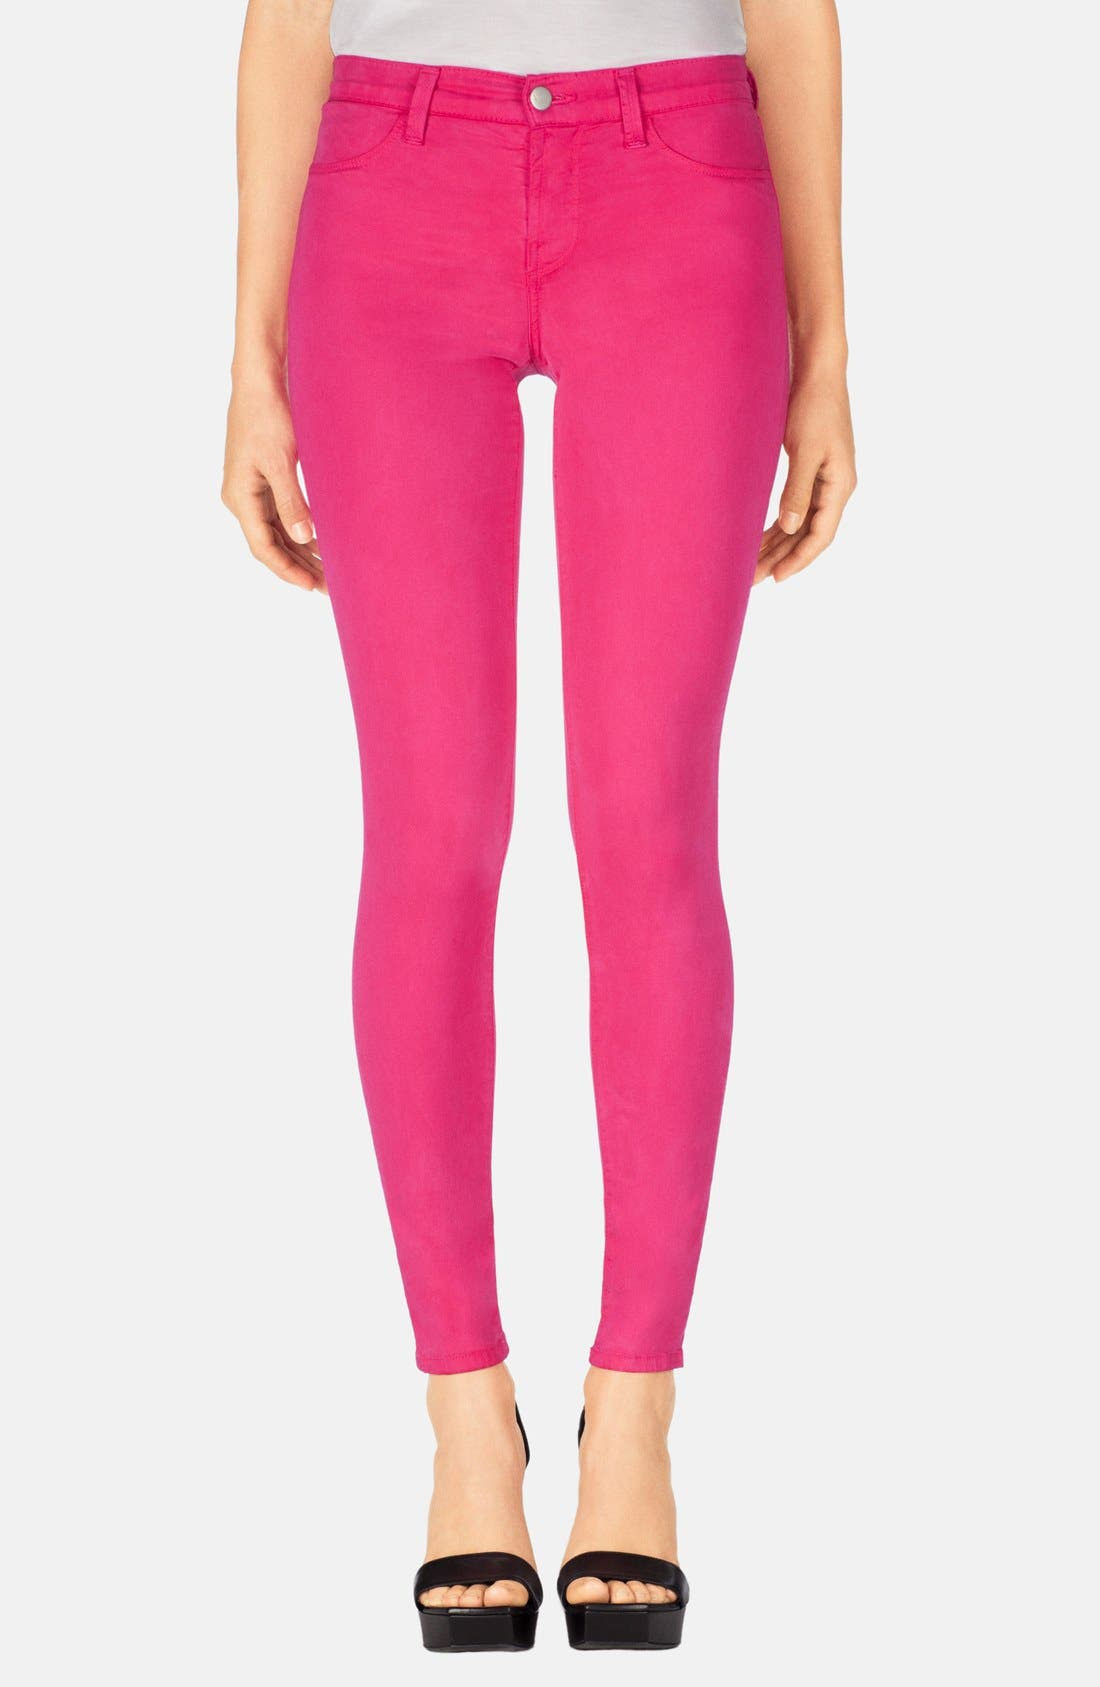 Alternate Image 1 Selected - J Brand '485' Mid Rise Super Skinny Jeans (Wildflower)